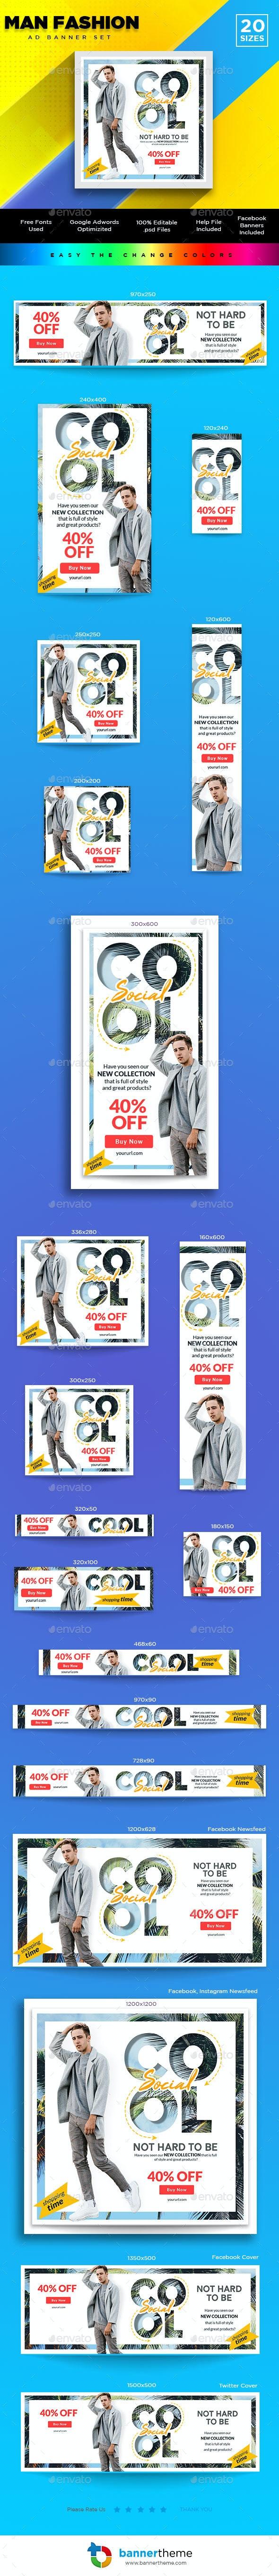 Man Fashion Banner - Banners & Ads Web Elements